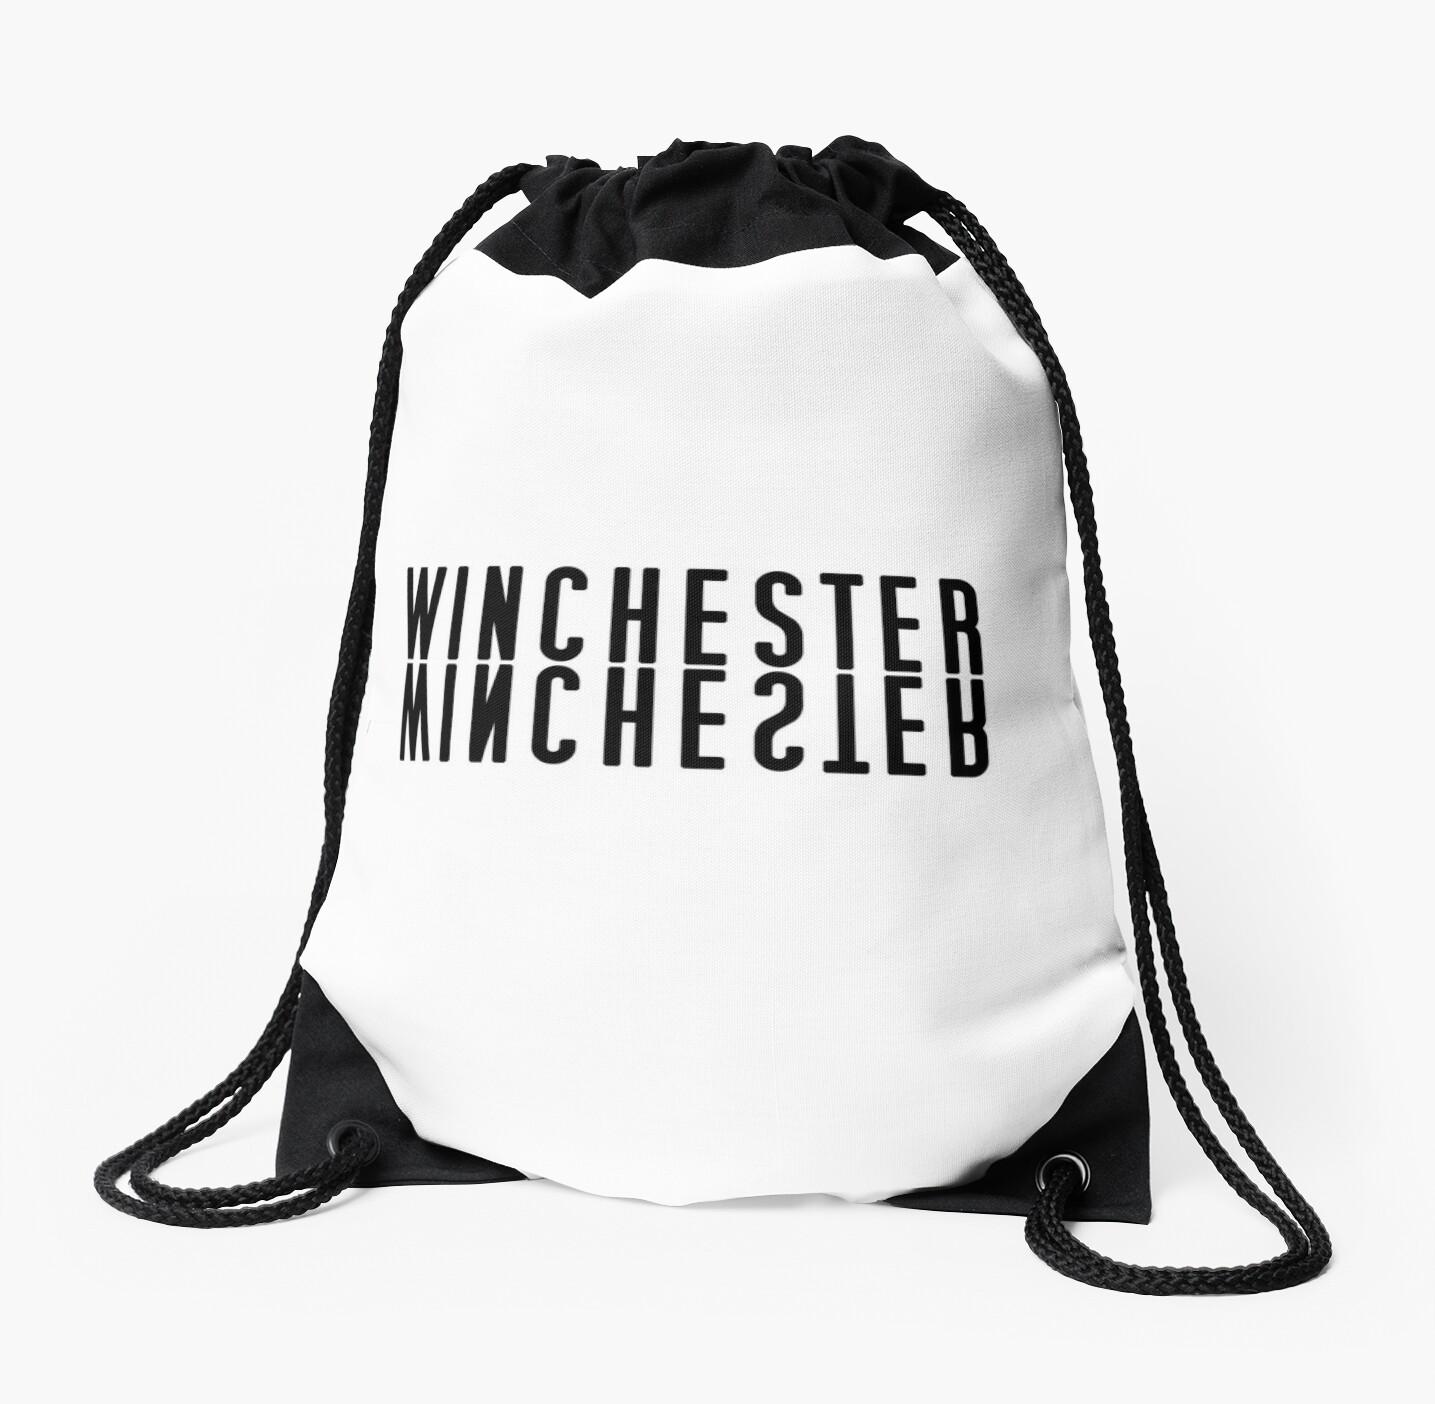 WINCHESTER by klaraawinchestr